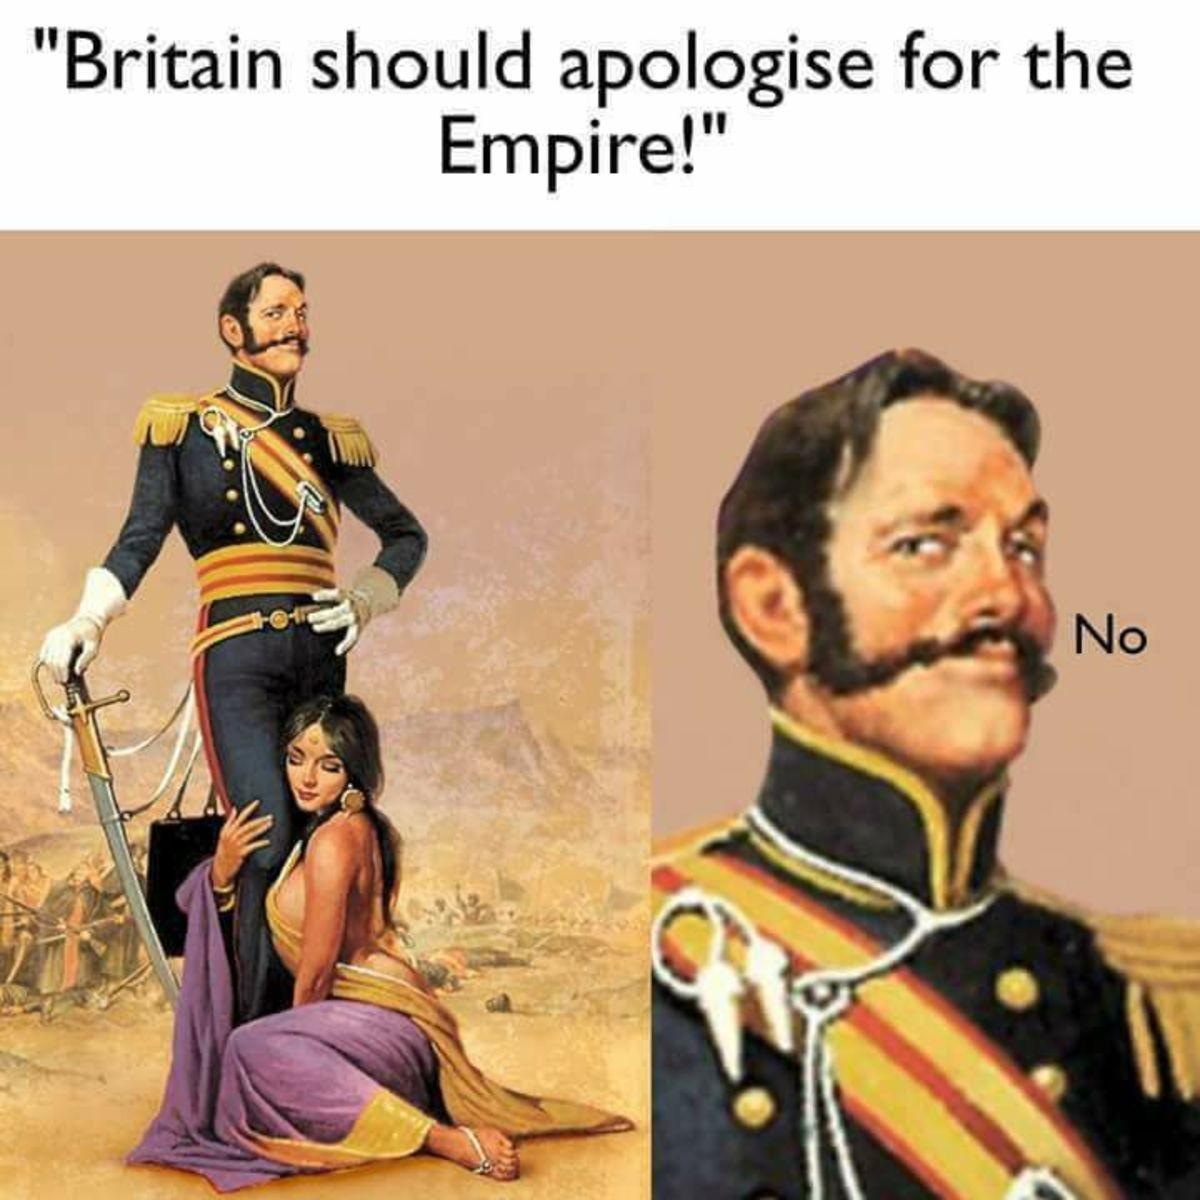 dongs in an empire - meme